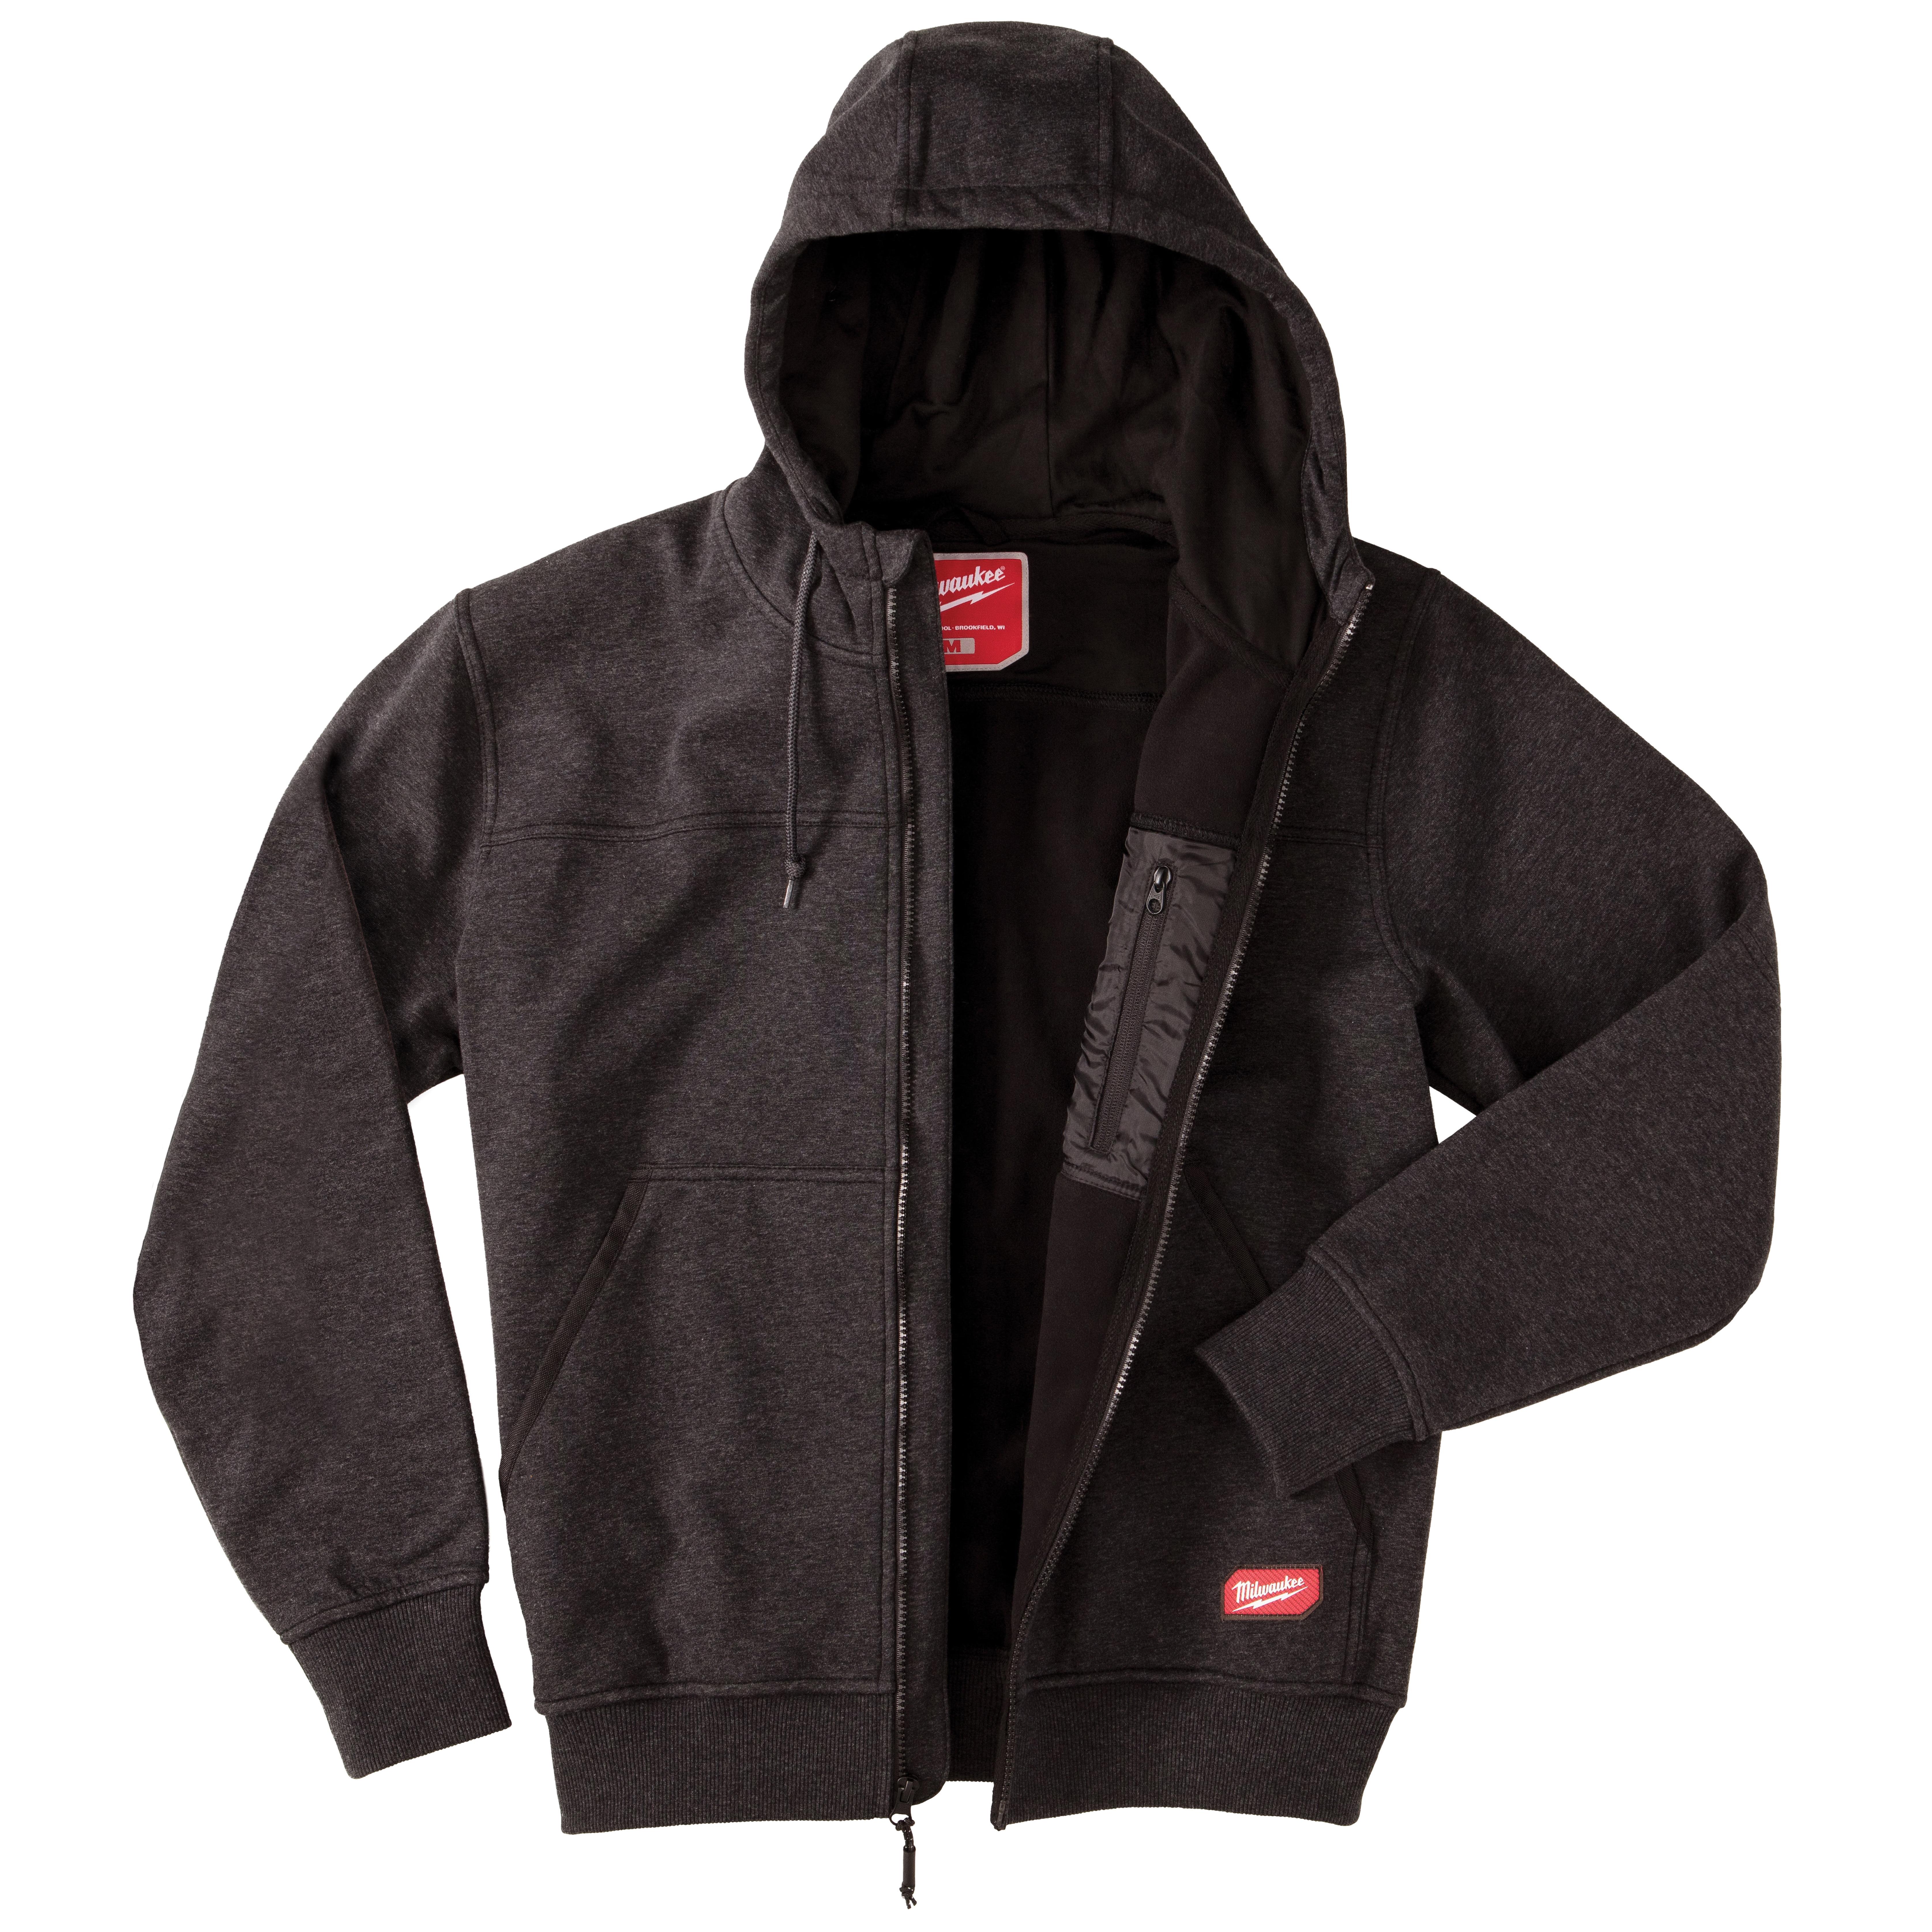 Milwaukee® NO DAYS OFF® 311B-2X Fleece Lining Sweatshirt, Men's, 2X, Black, Polyester